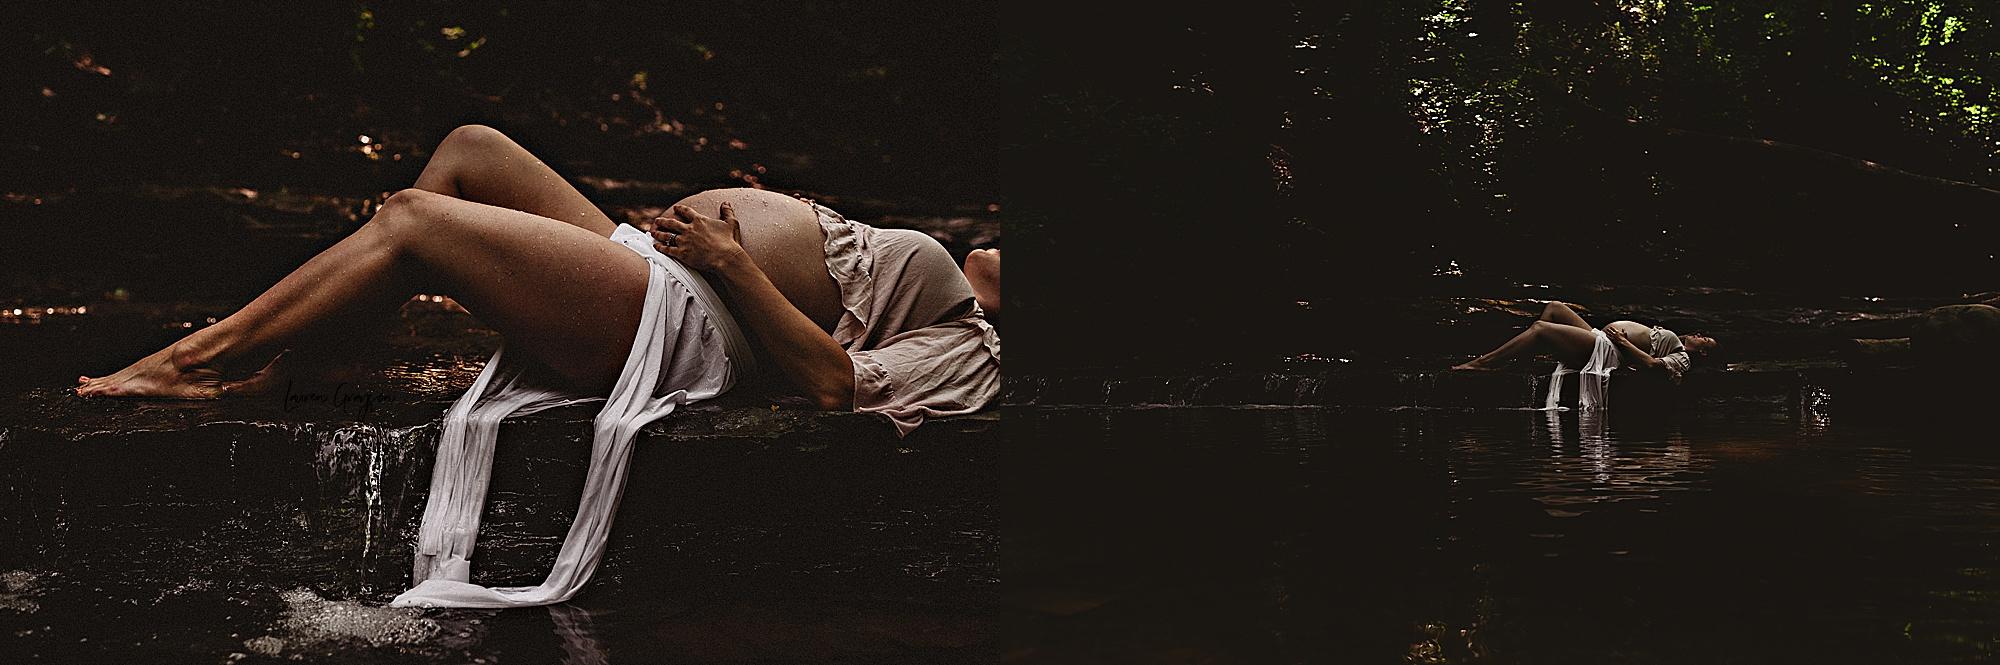 lauren-grayson-photography-akron-ohio-maternity-photographer-waterfall-sarah-f_0008.jpg